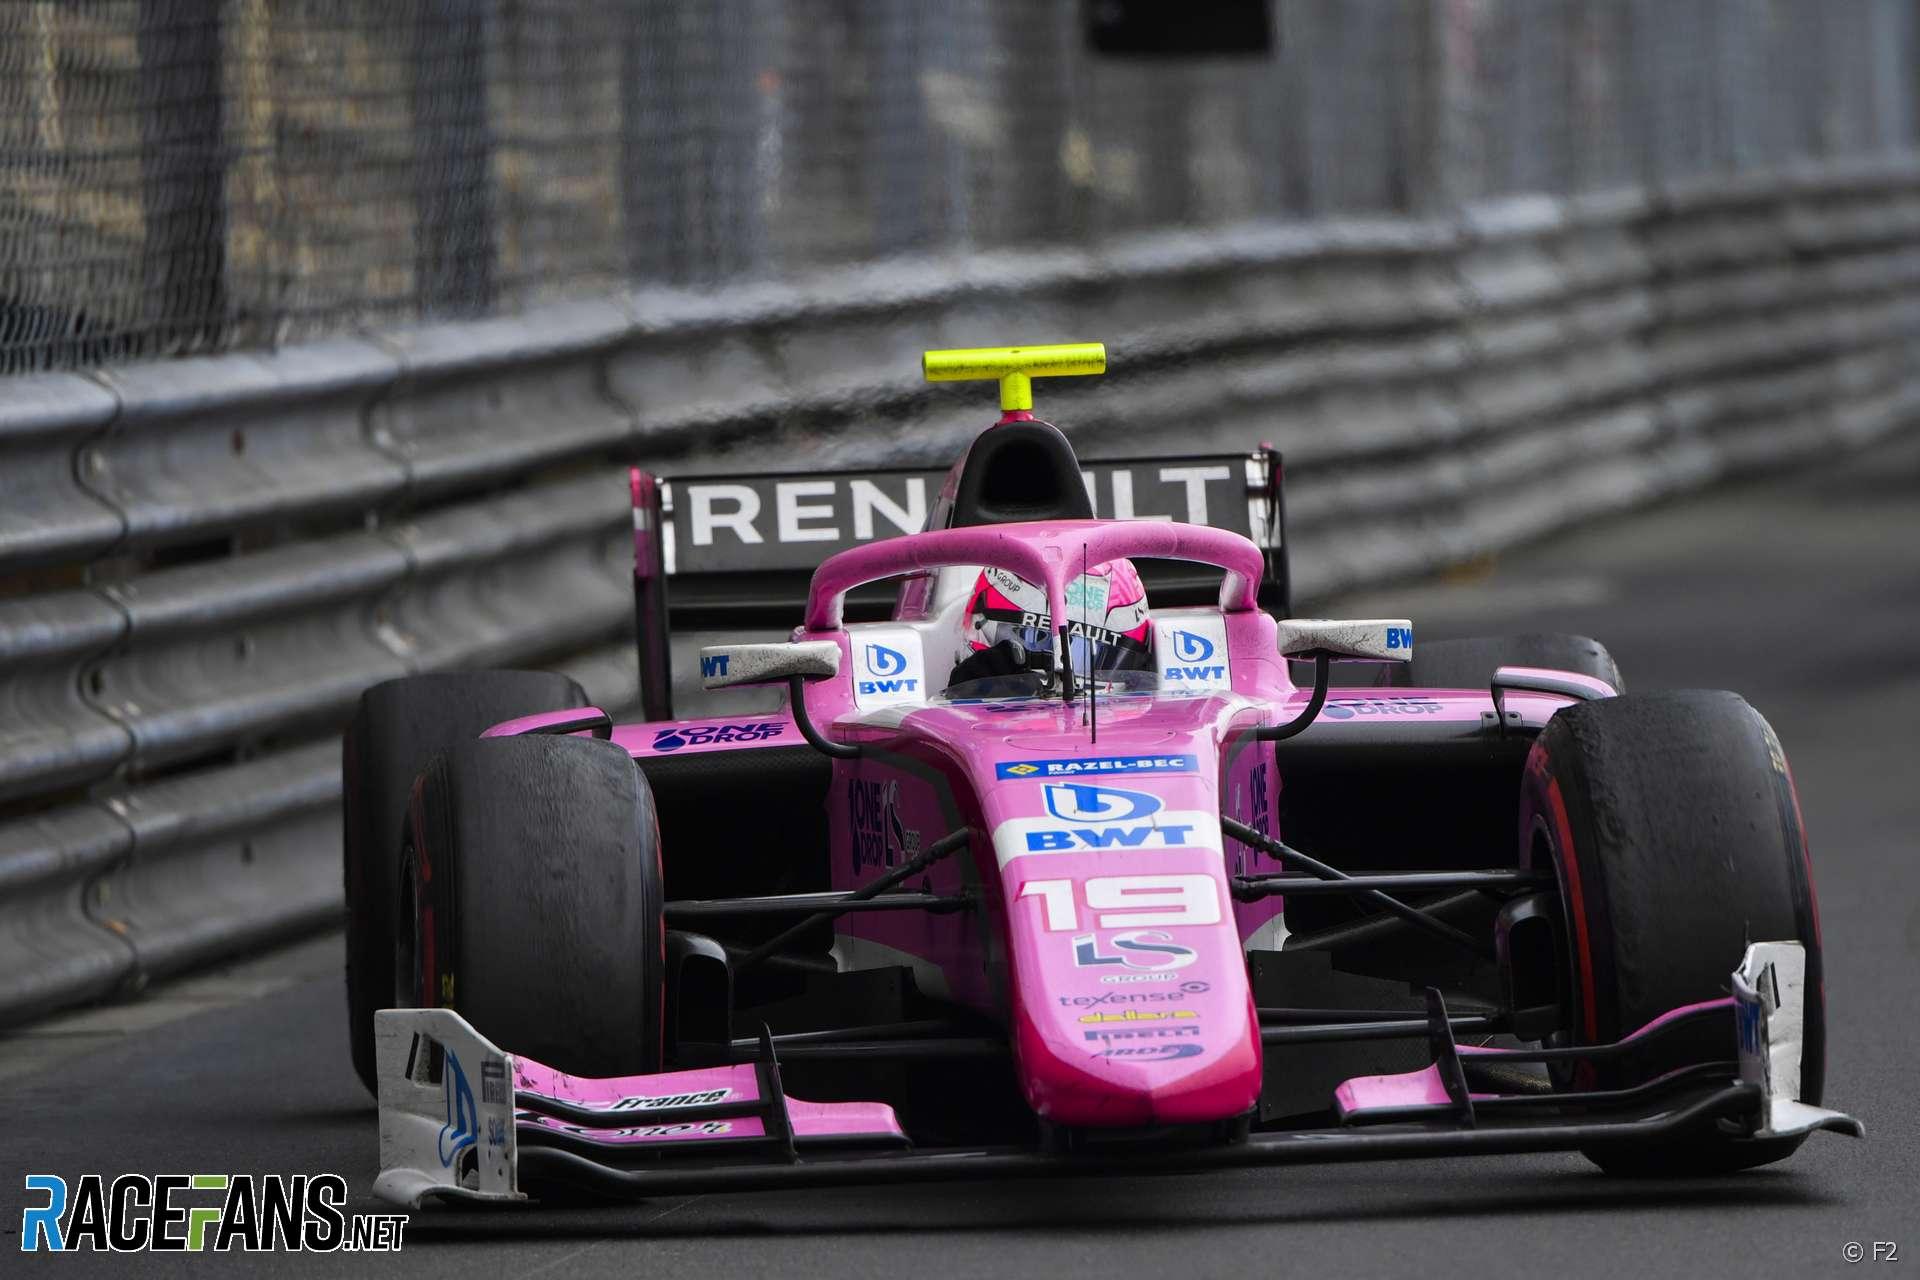 Anthoine Hubert, Monaco, F2, 2019